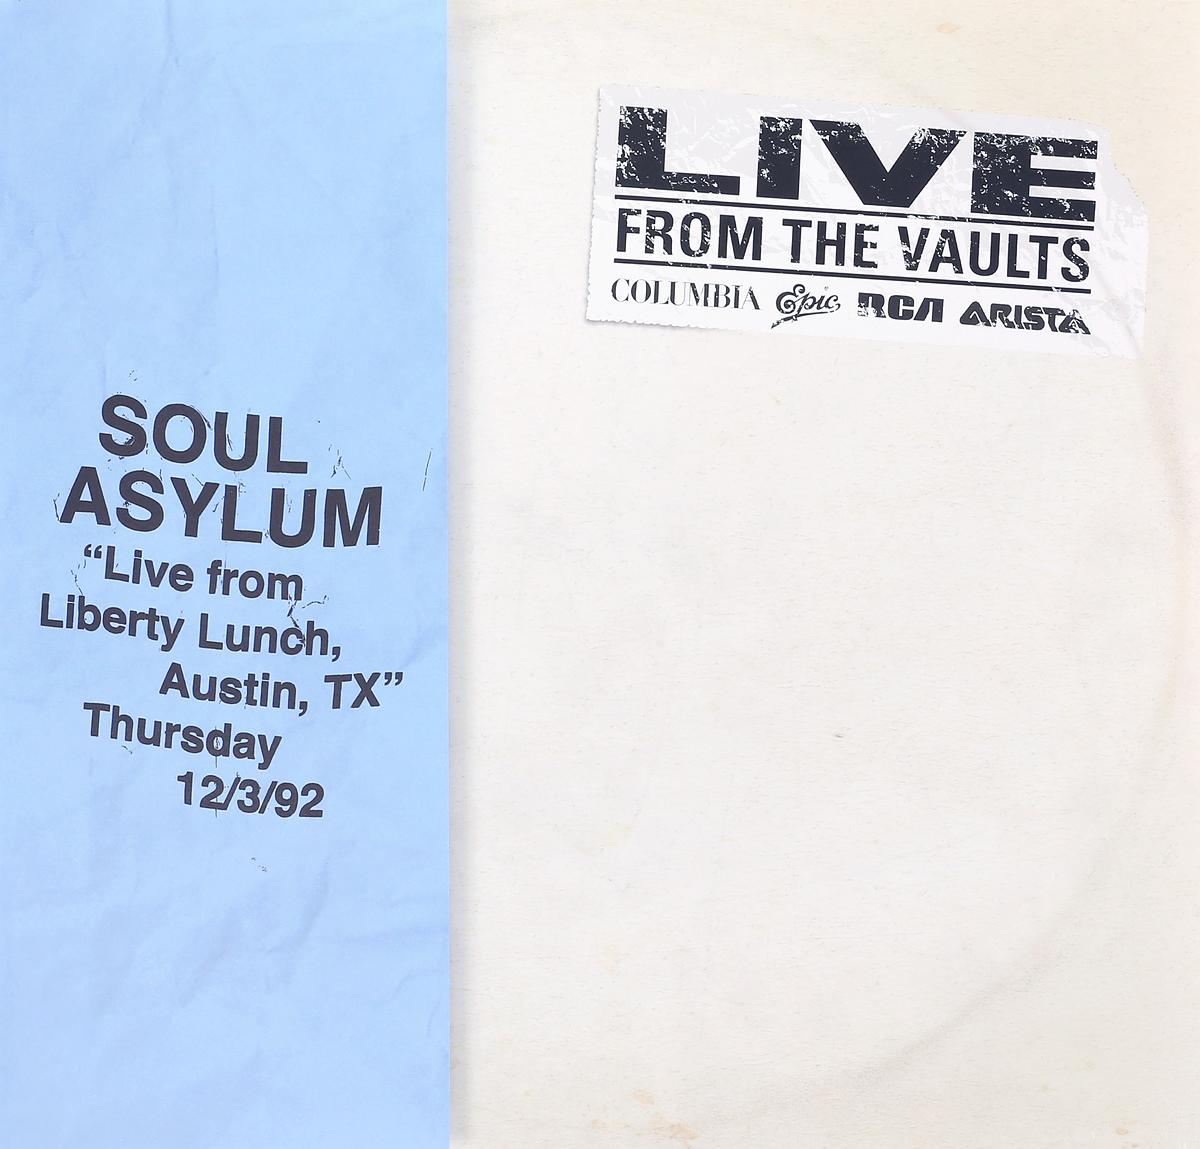 Soul Asylum Soul Asylum. Live From Liberty Lunch, Austin, TX, December 3, 1992 (2 LP) roux m asylum